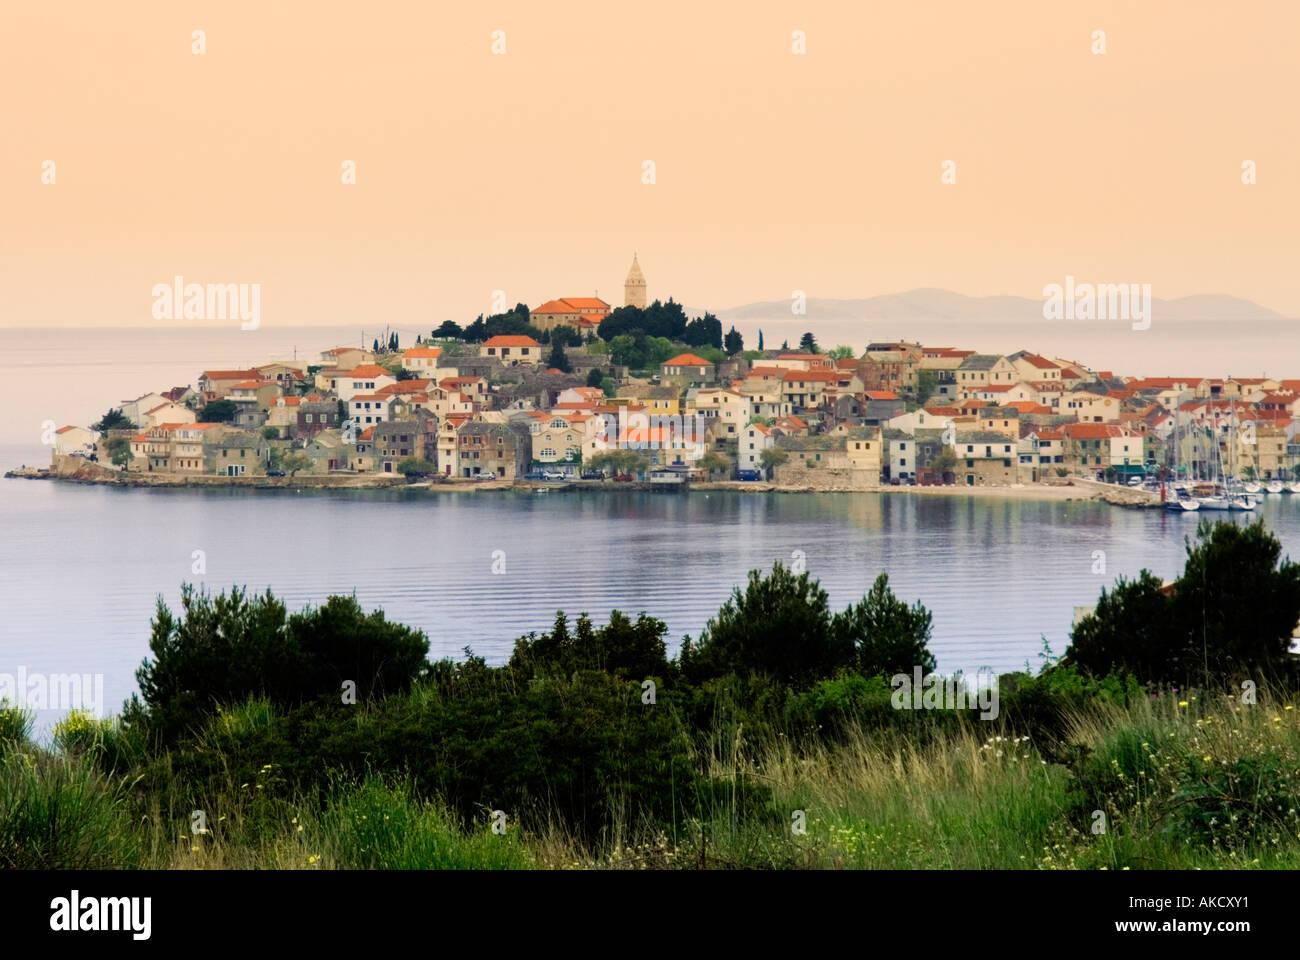 South-East Europe, Croatia, Dalmatia, Primosten town, view from headland Stock Photo